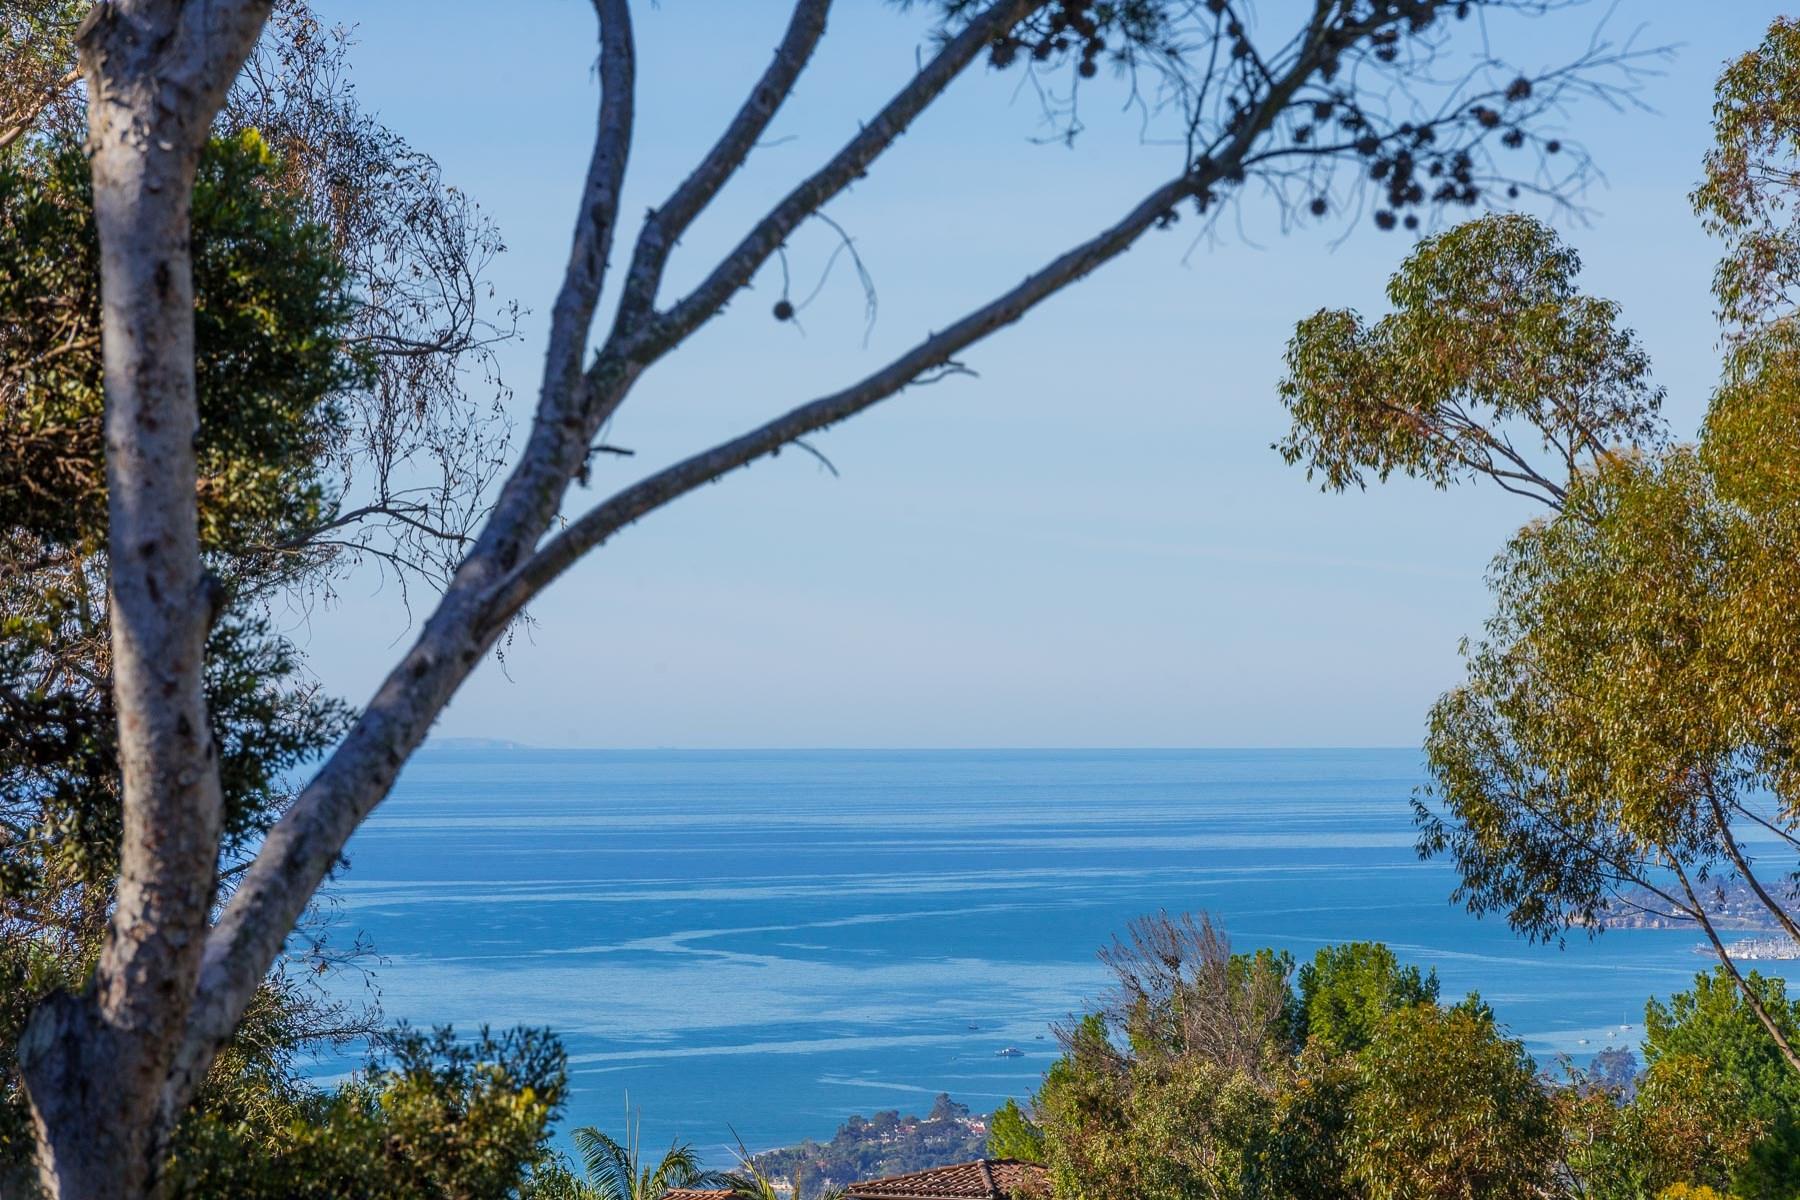 Land for Sale at Impressive Ocean and Mountain View Lot 885 Toro Canyon Santa Barbara, California 93108 United States